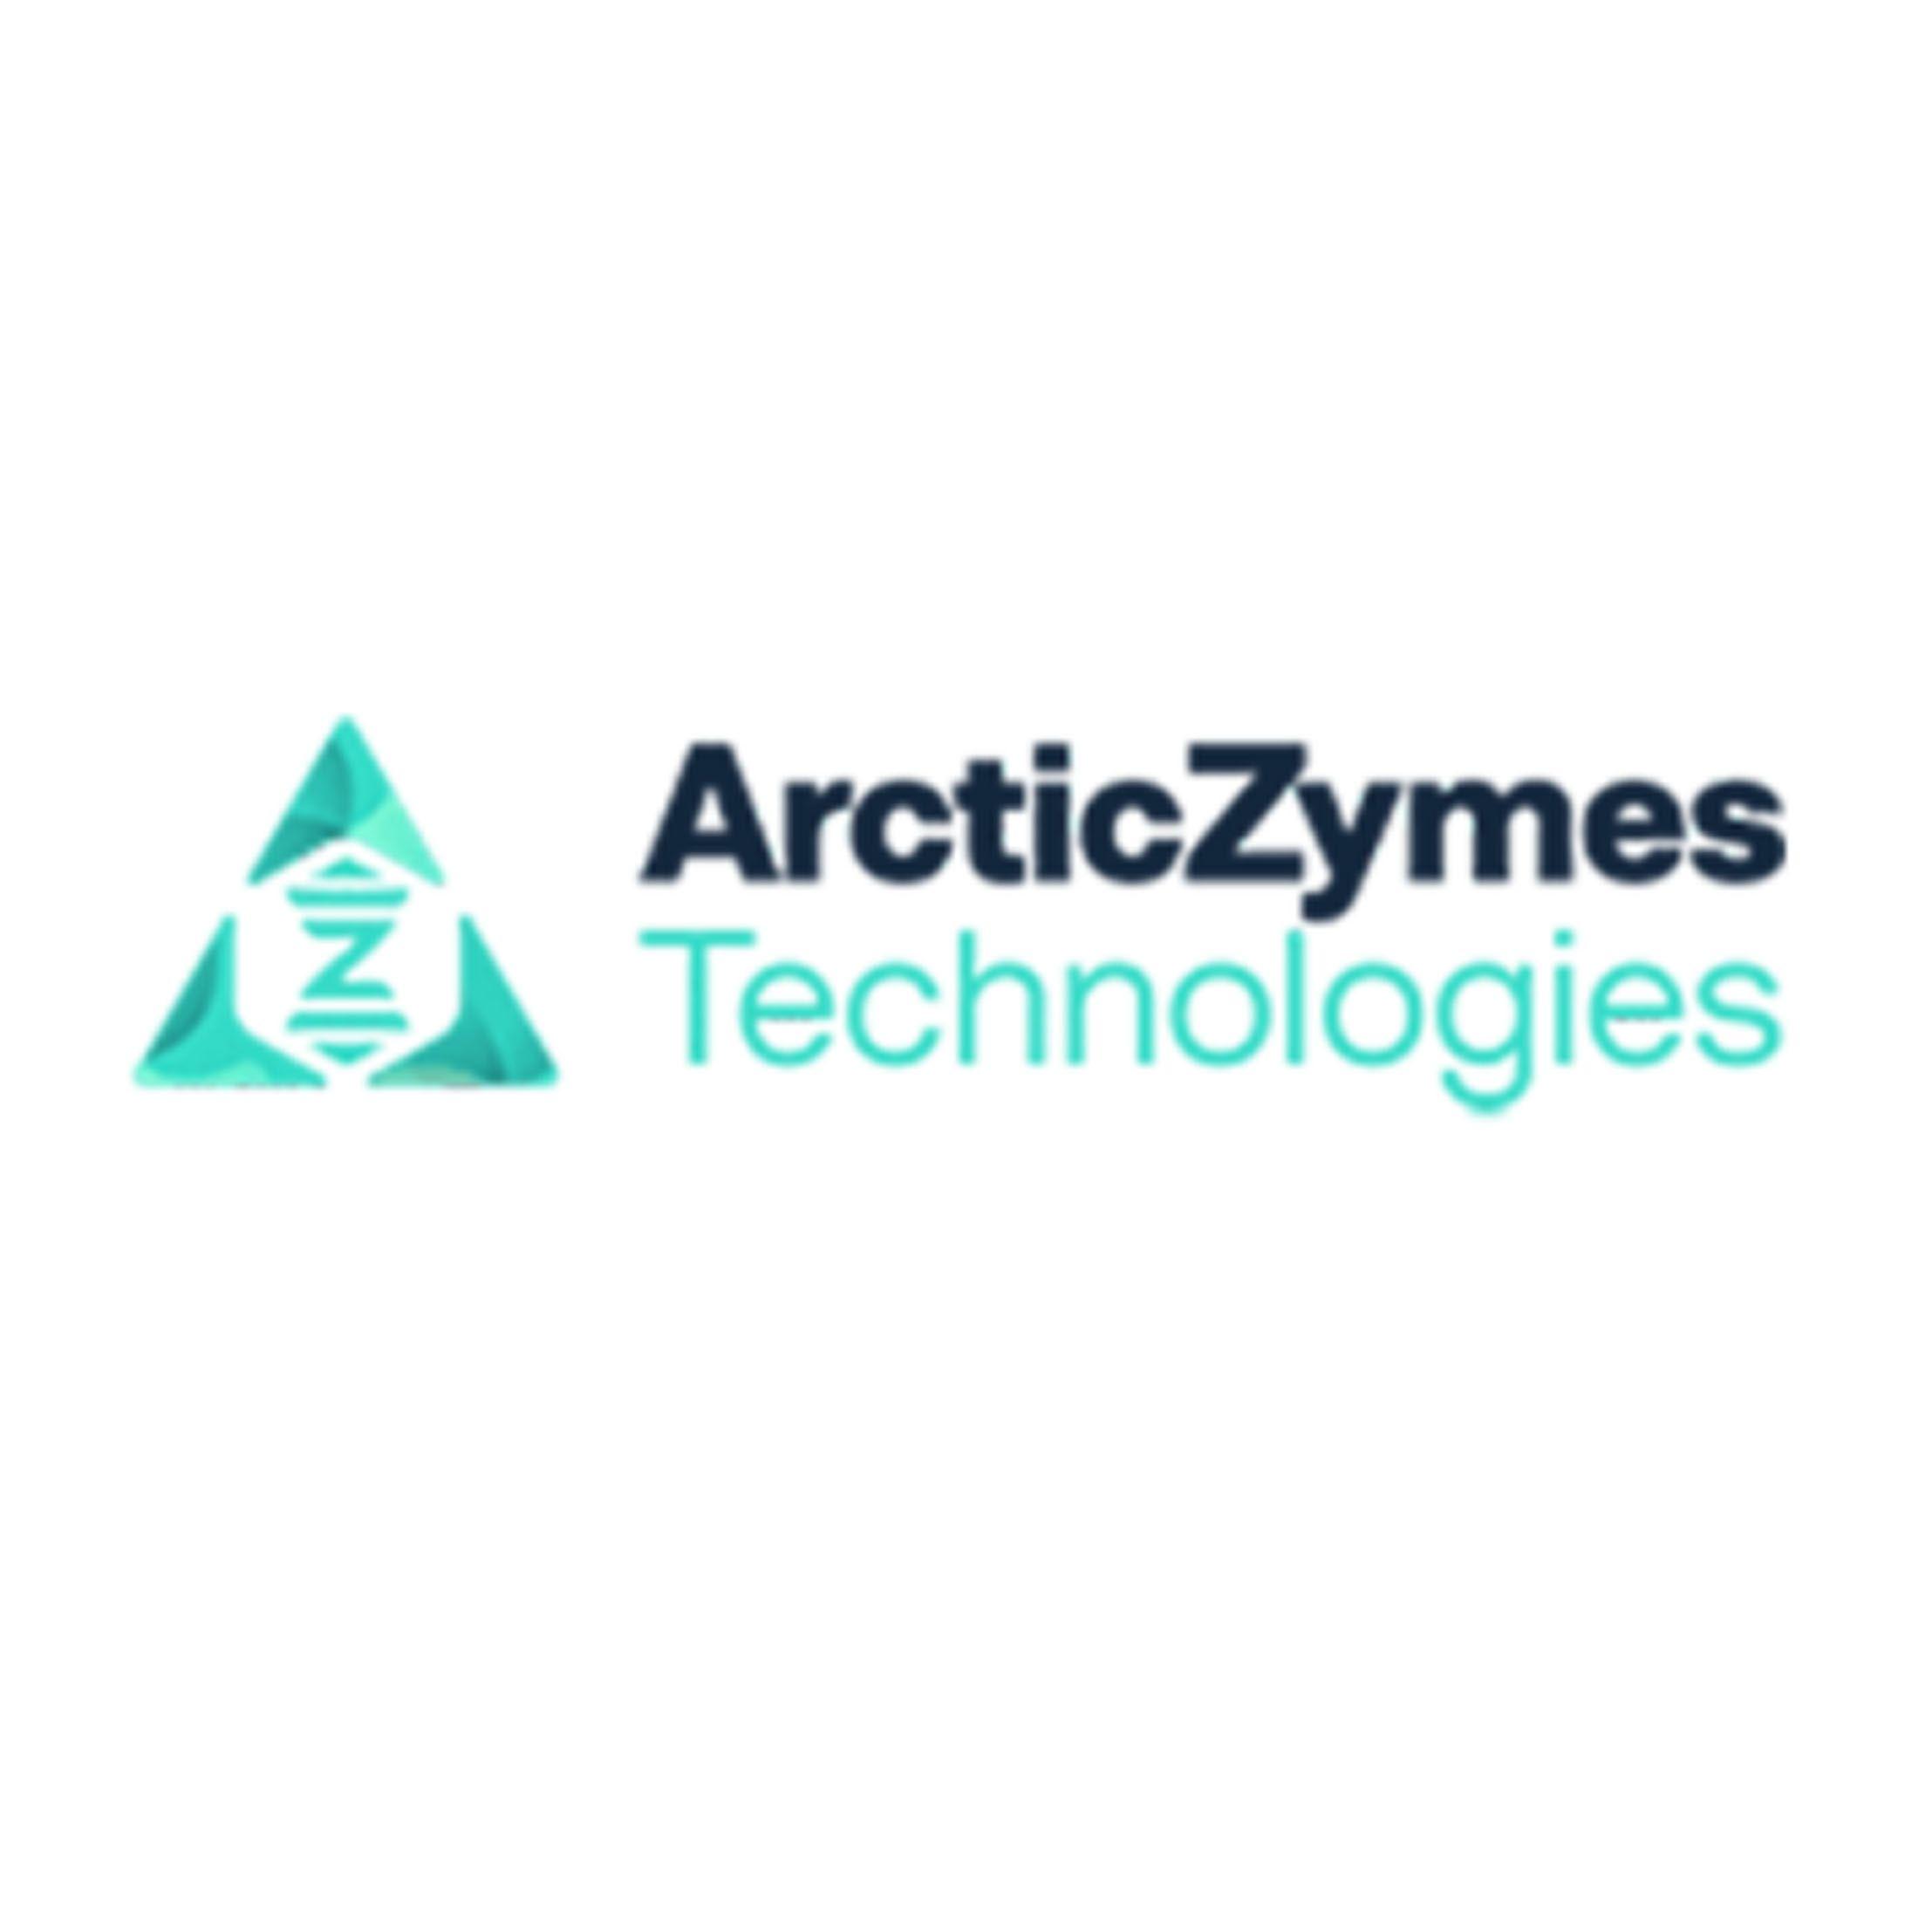 ArcticZymes分子研究、体外诊断和治疗